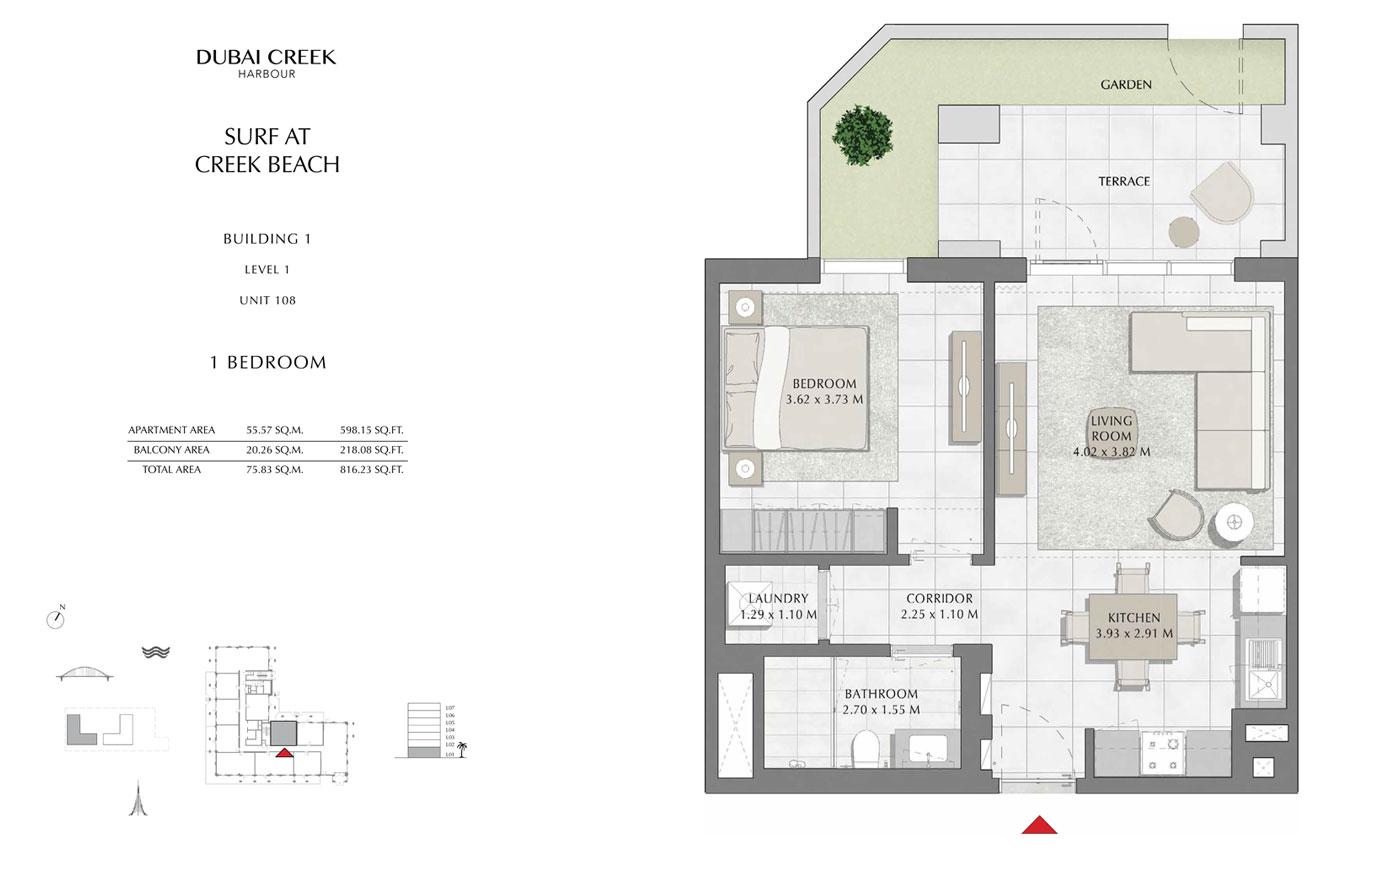 Building-1-1-Bedroom,-Level-1,-Unit-108,-Size-816 sq.ft